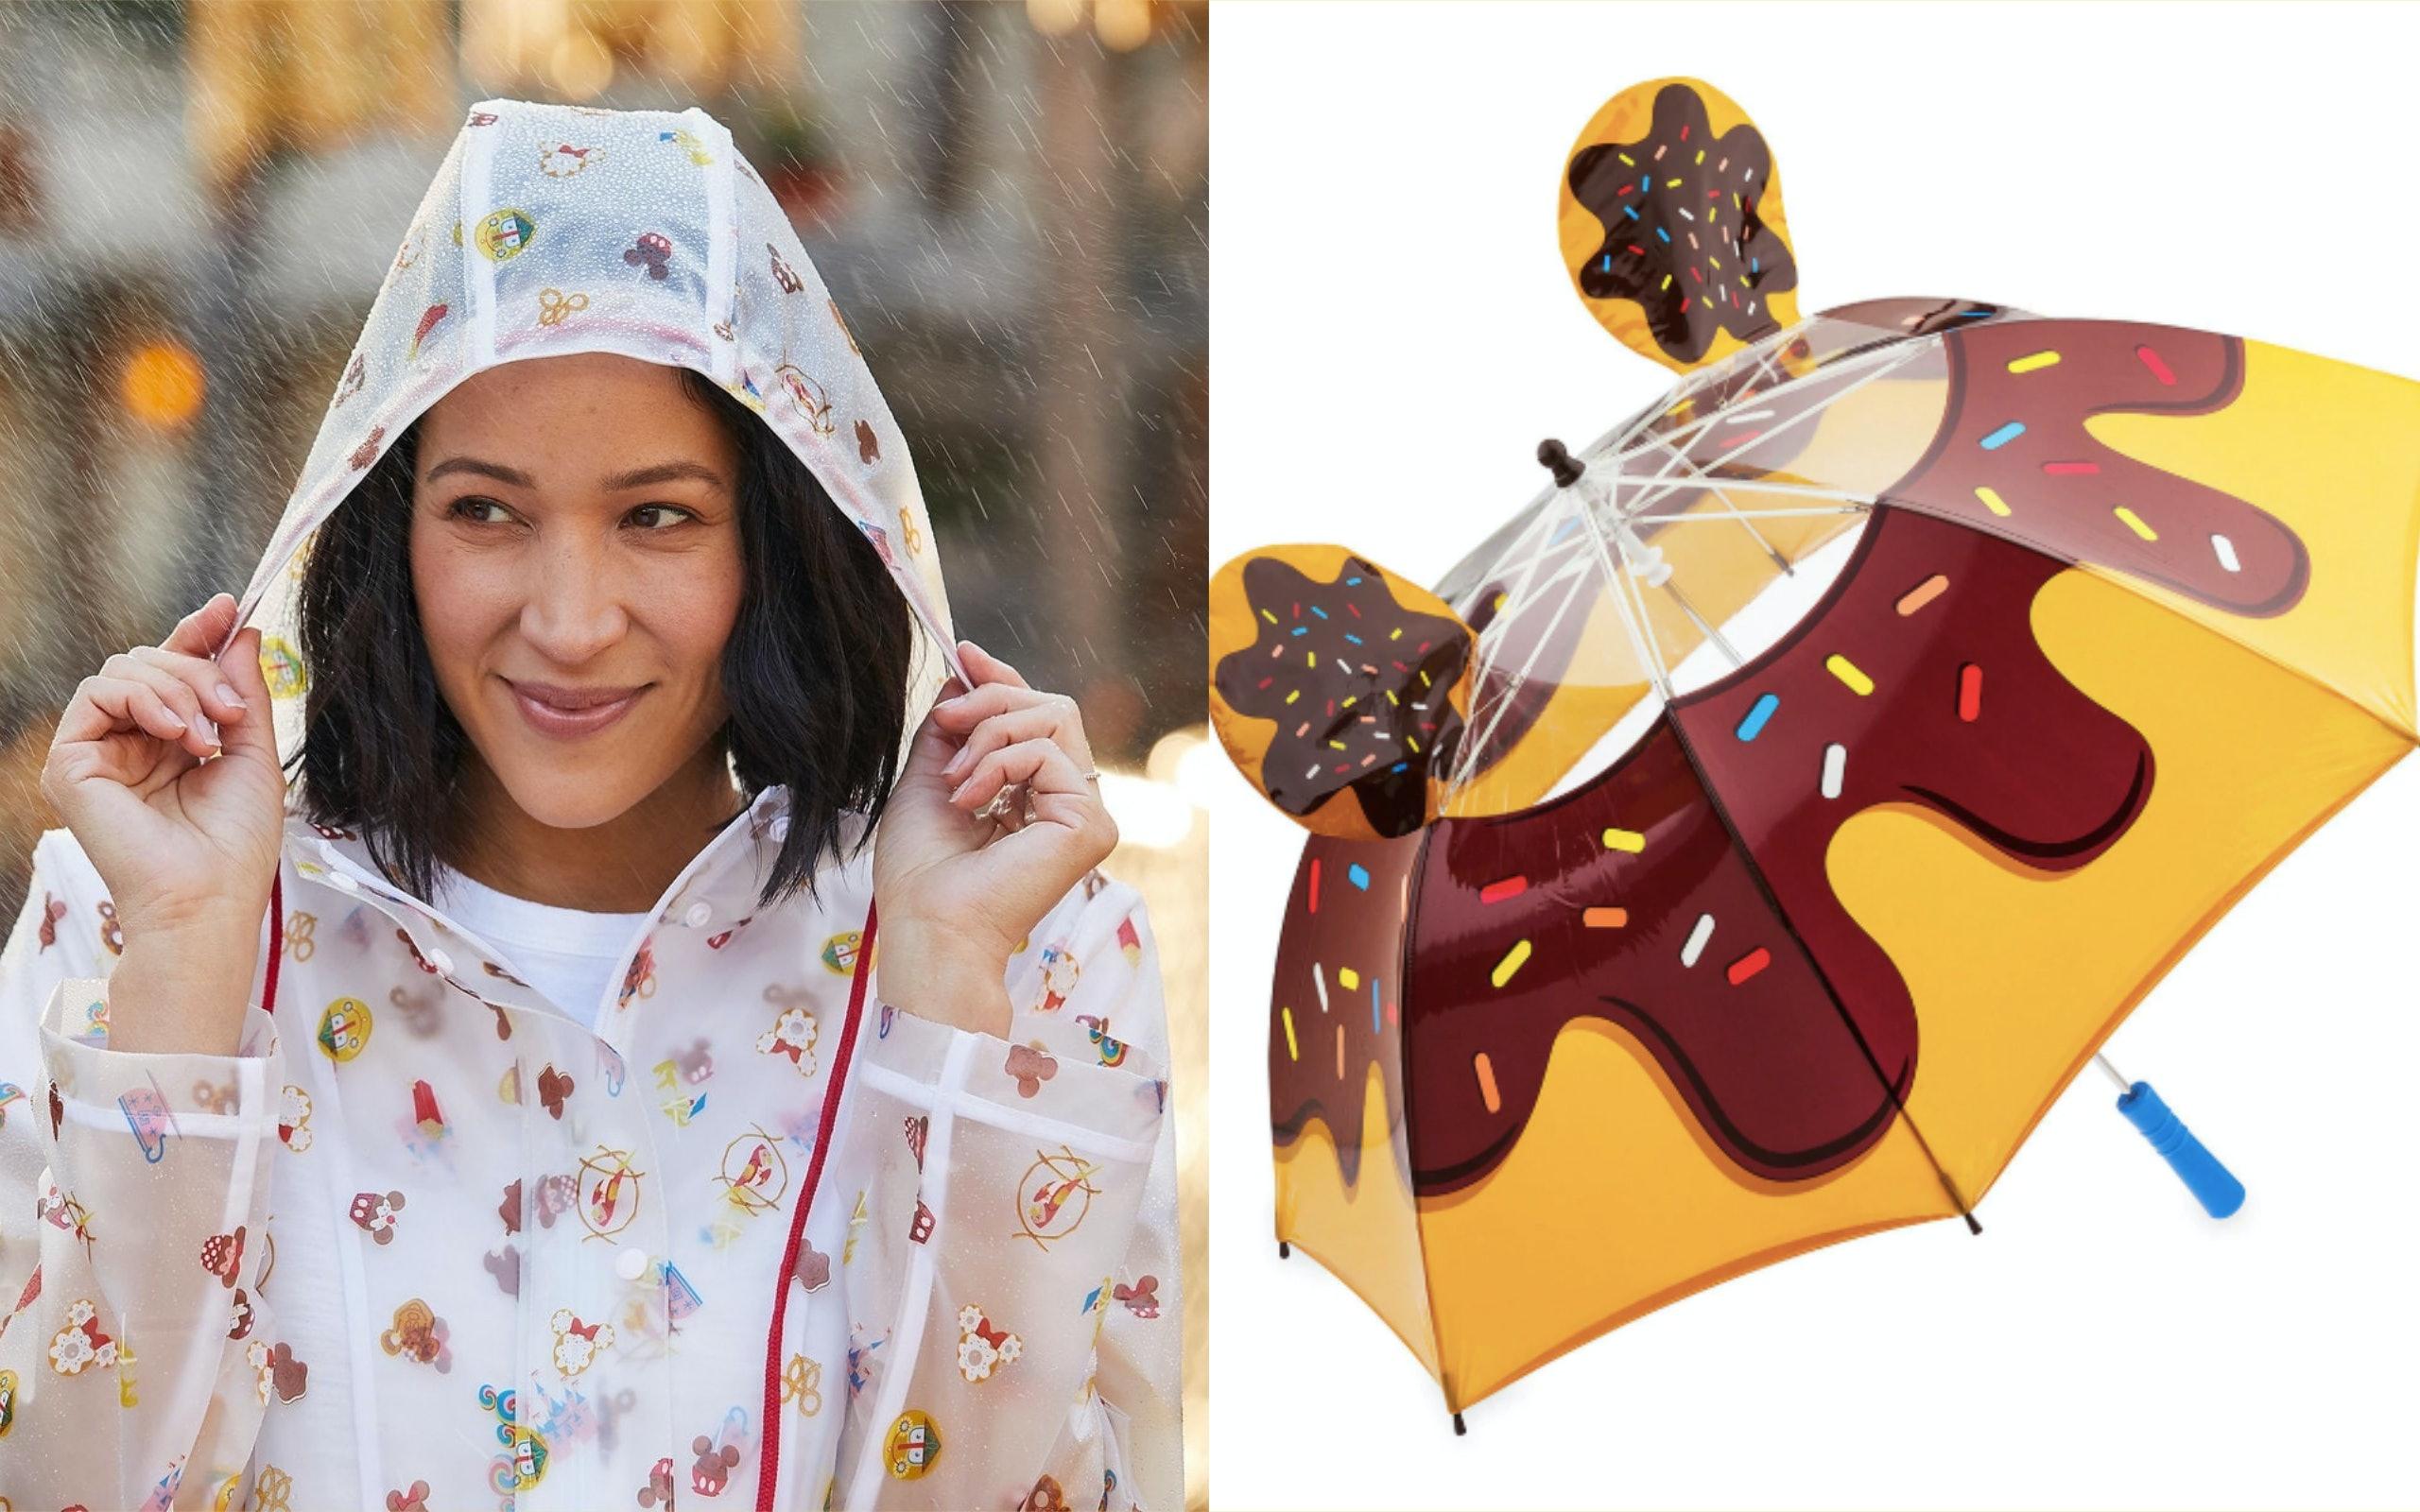 Disney's Rain Gear For Grownups Is So Cute You'll Wish For